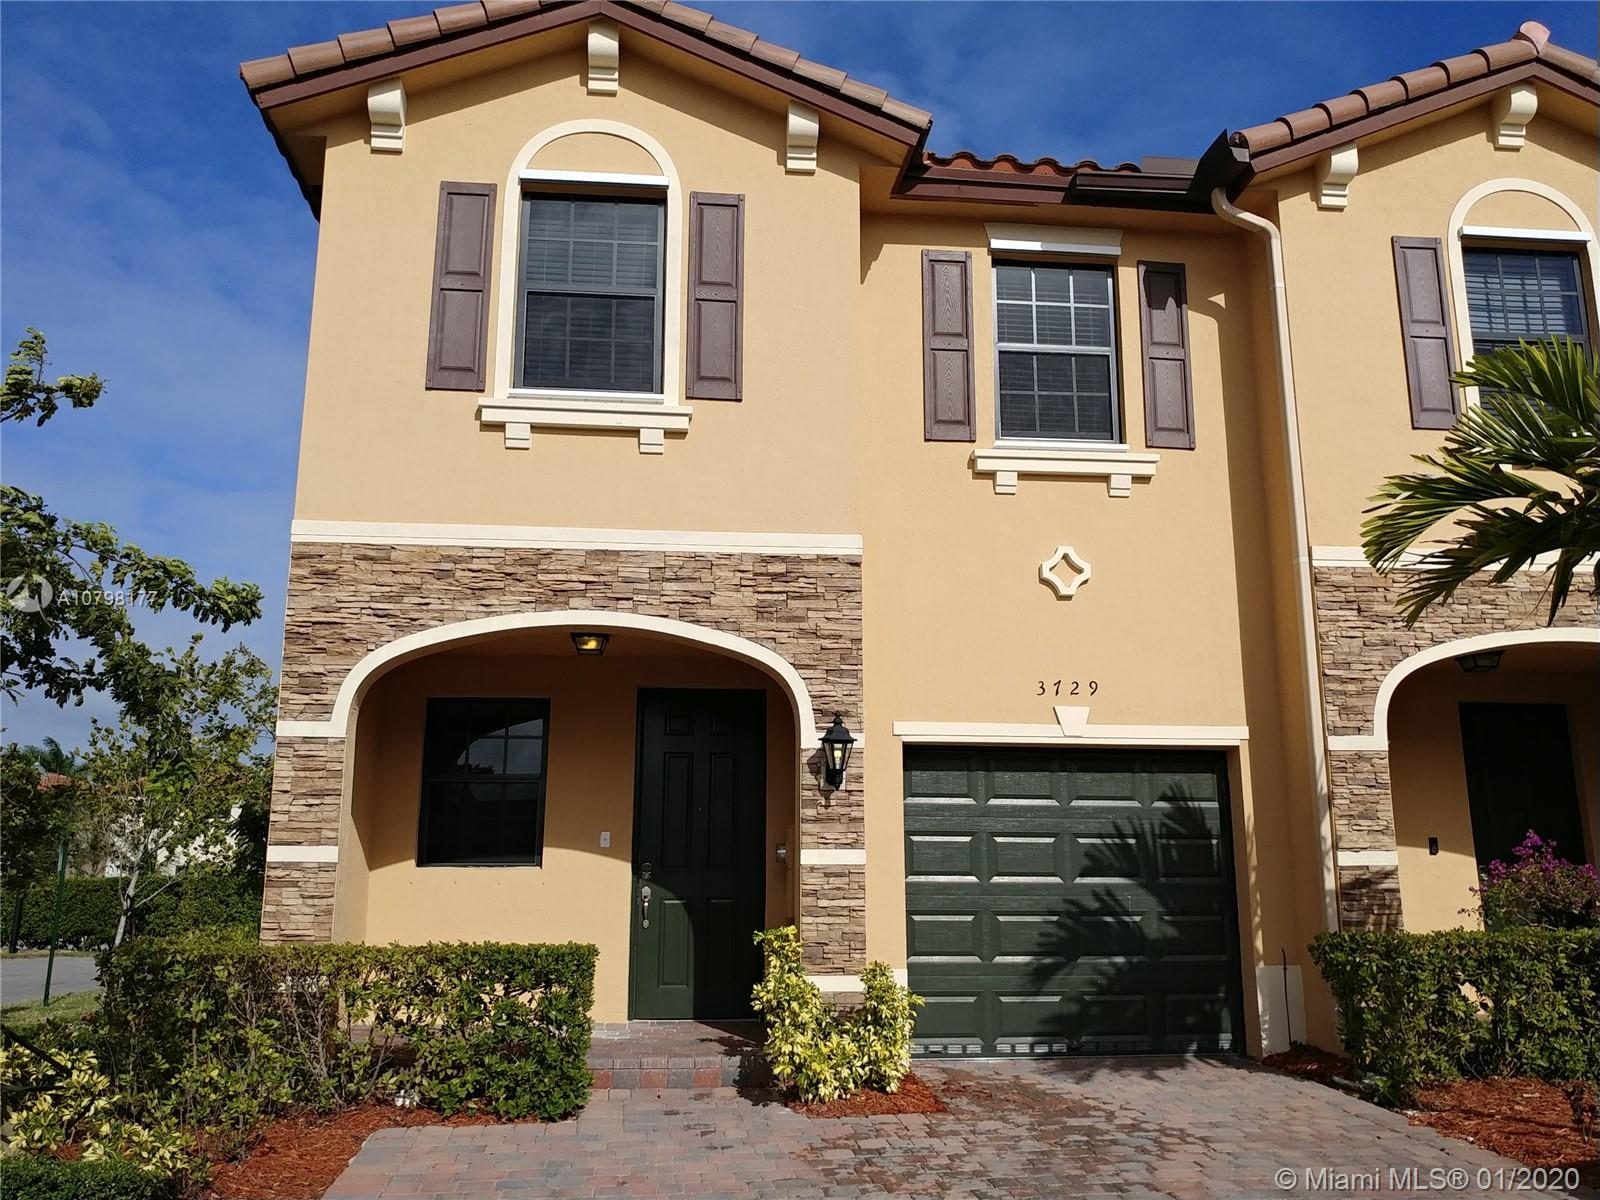 3729 SE 1st St, Homestead, FL 33033 - Homestead, FL real estate listing